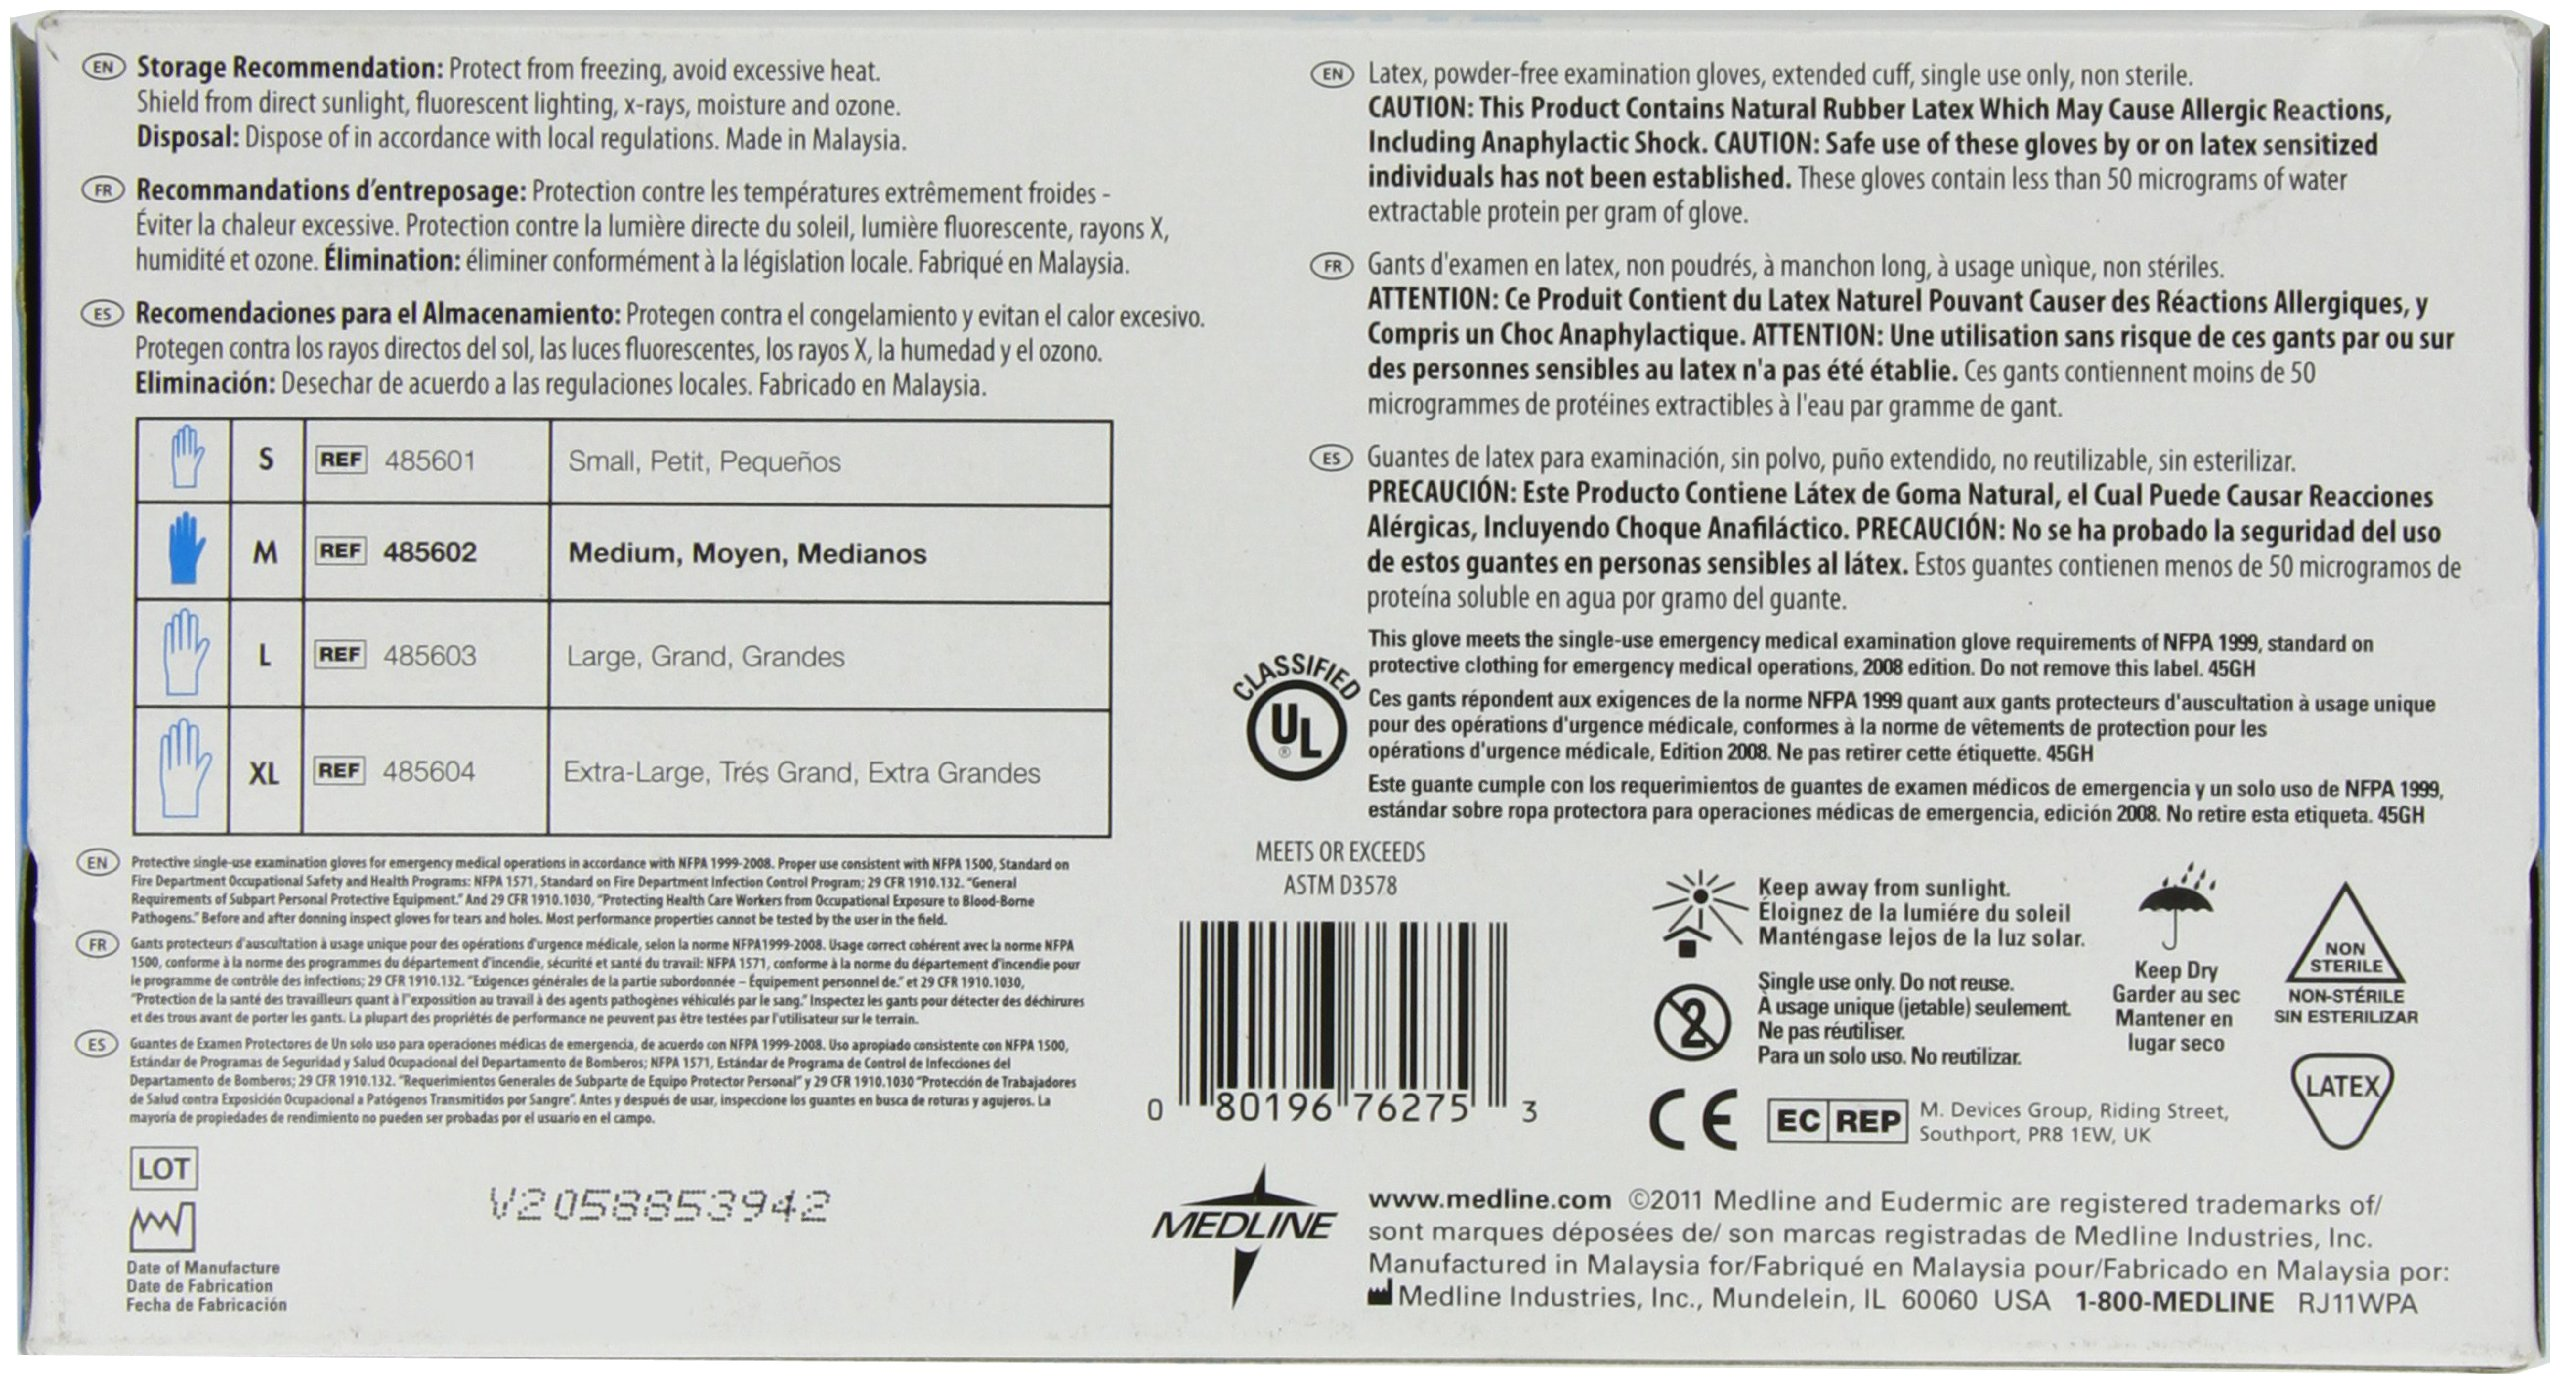 Medline Eudermic MP 12 Inches High Risk Exam Gloves, Medium, 50 Count by Medline (Image #2)